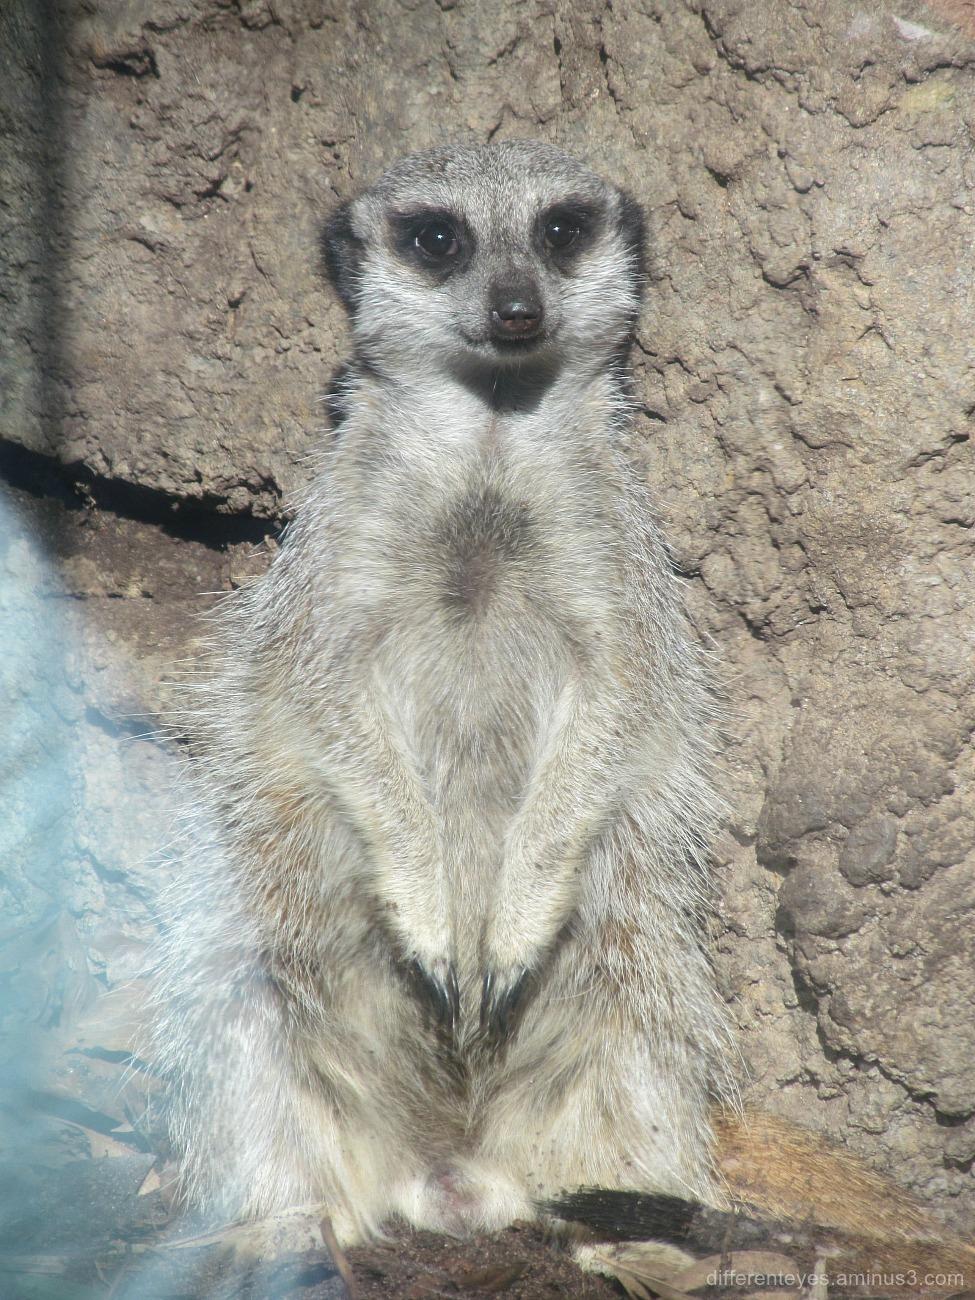 meerkat at Melbourne Zoo